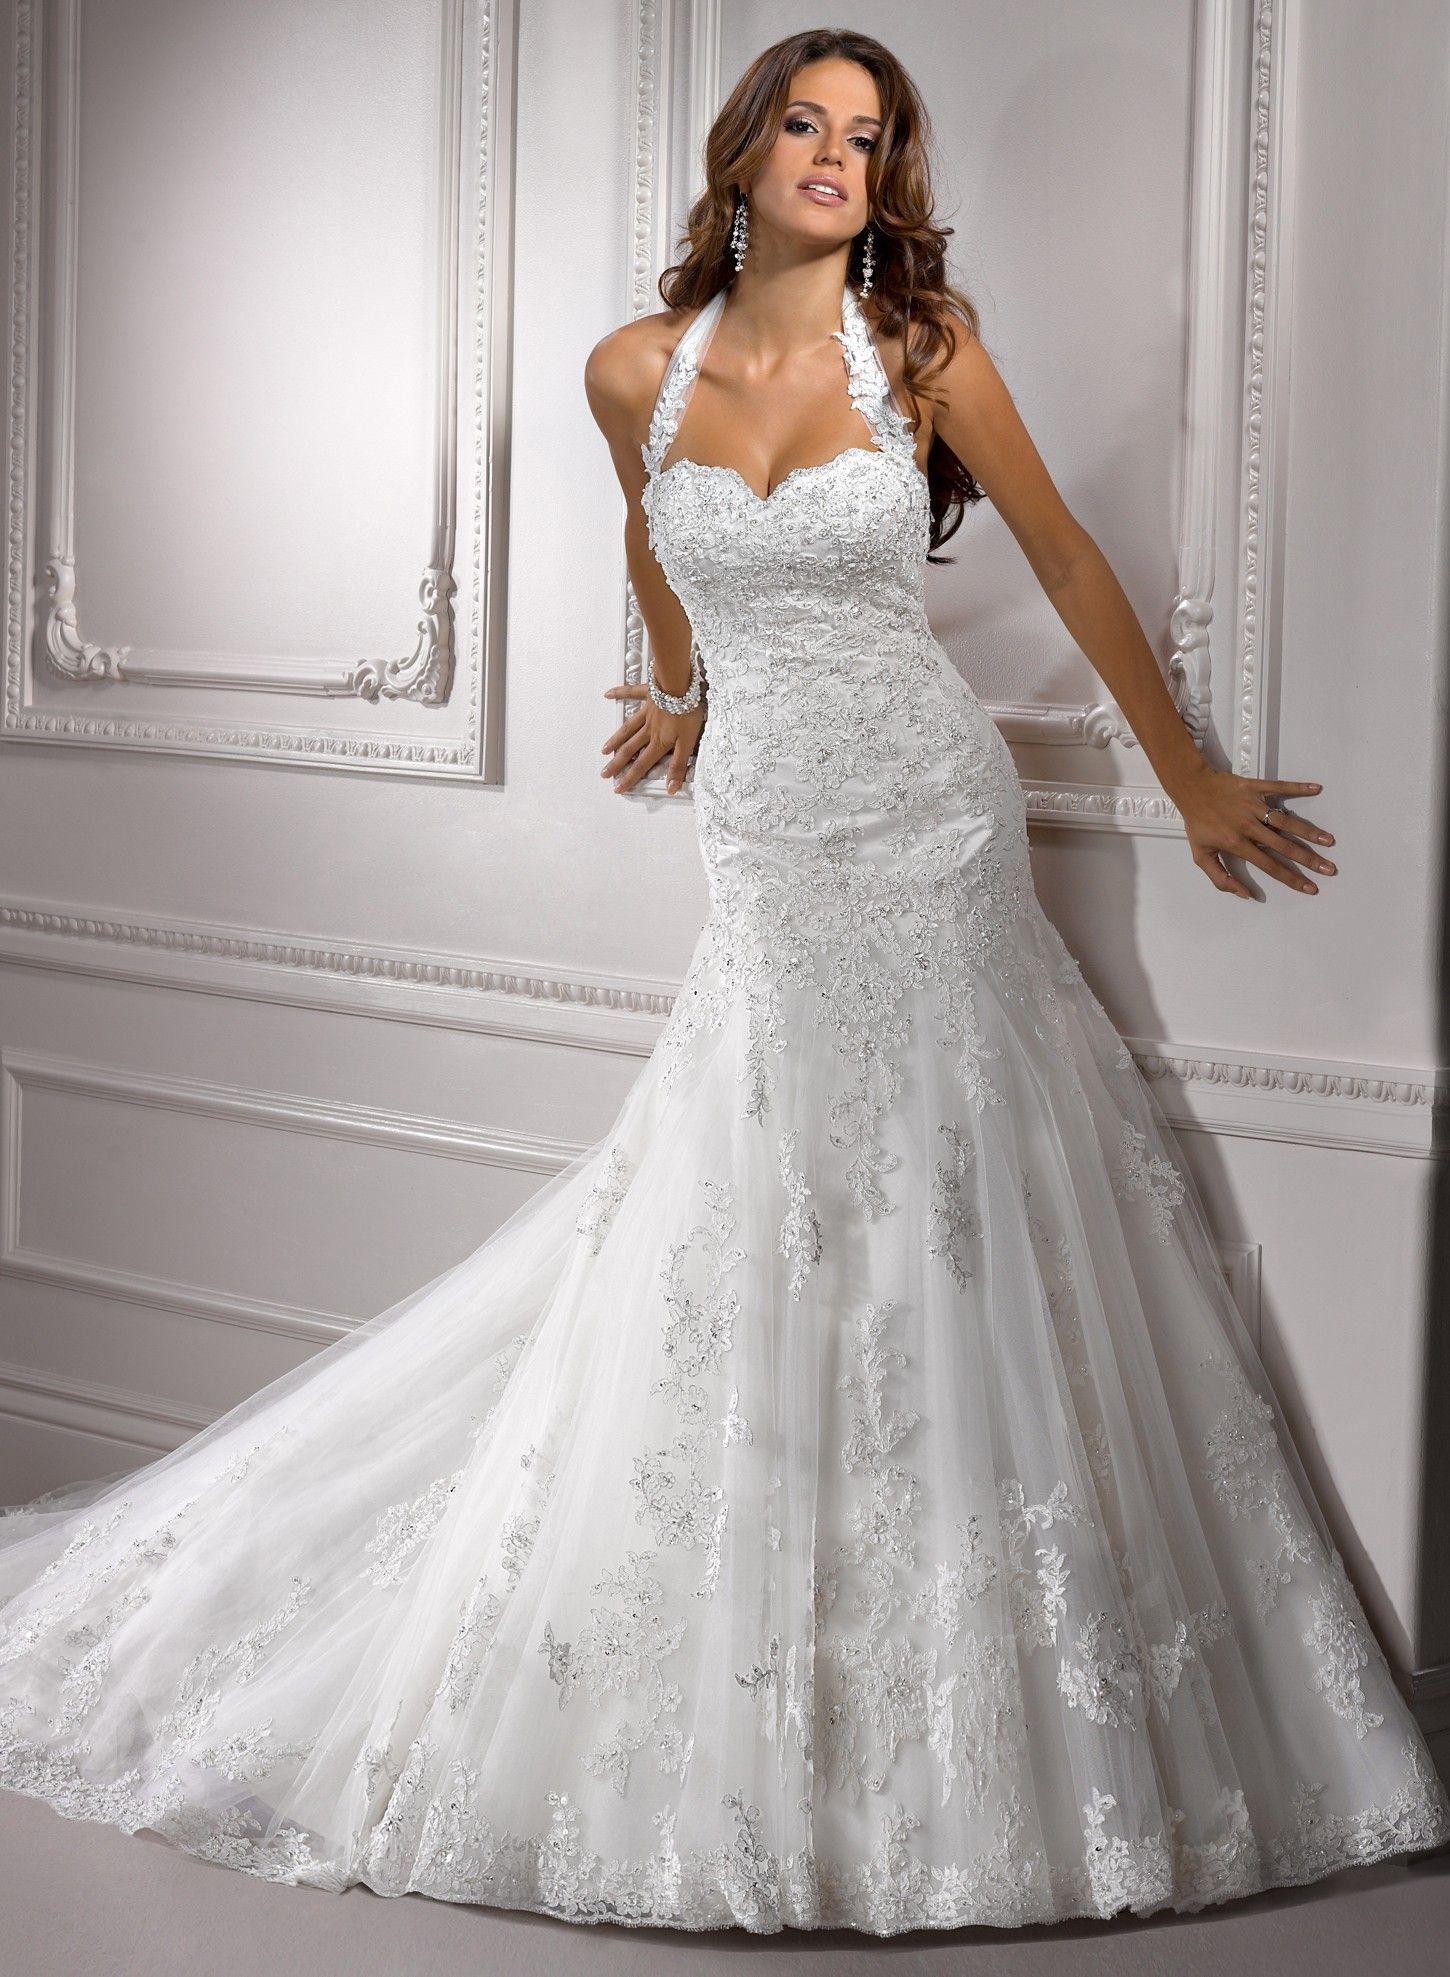 Cute  best Halter Wedding Dress images on Pinterest Wedding dressses Halter wedding dresses and Wedding dress styles